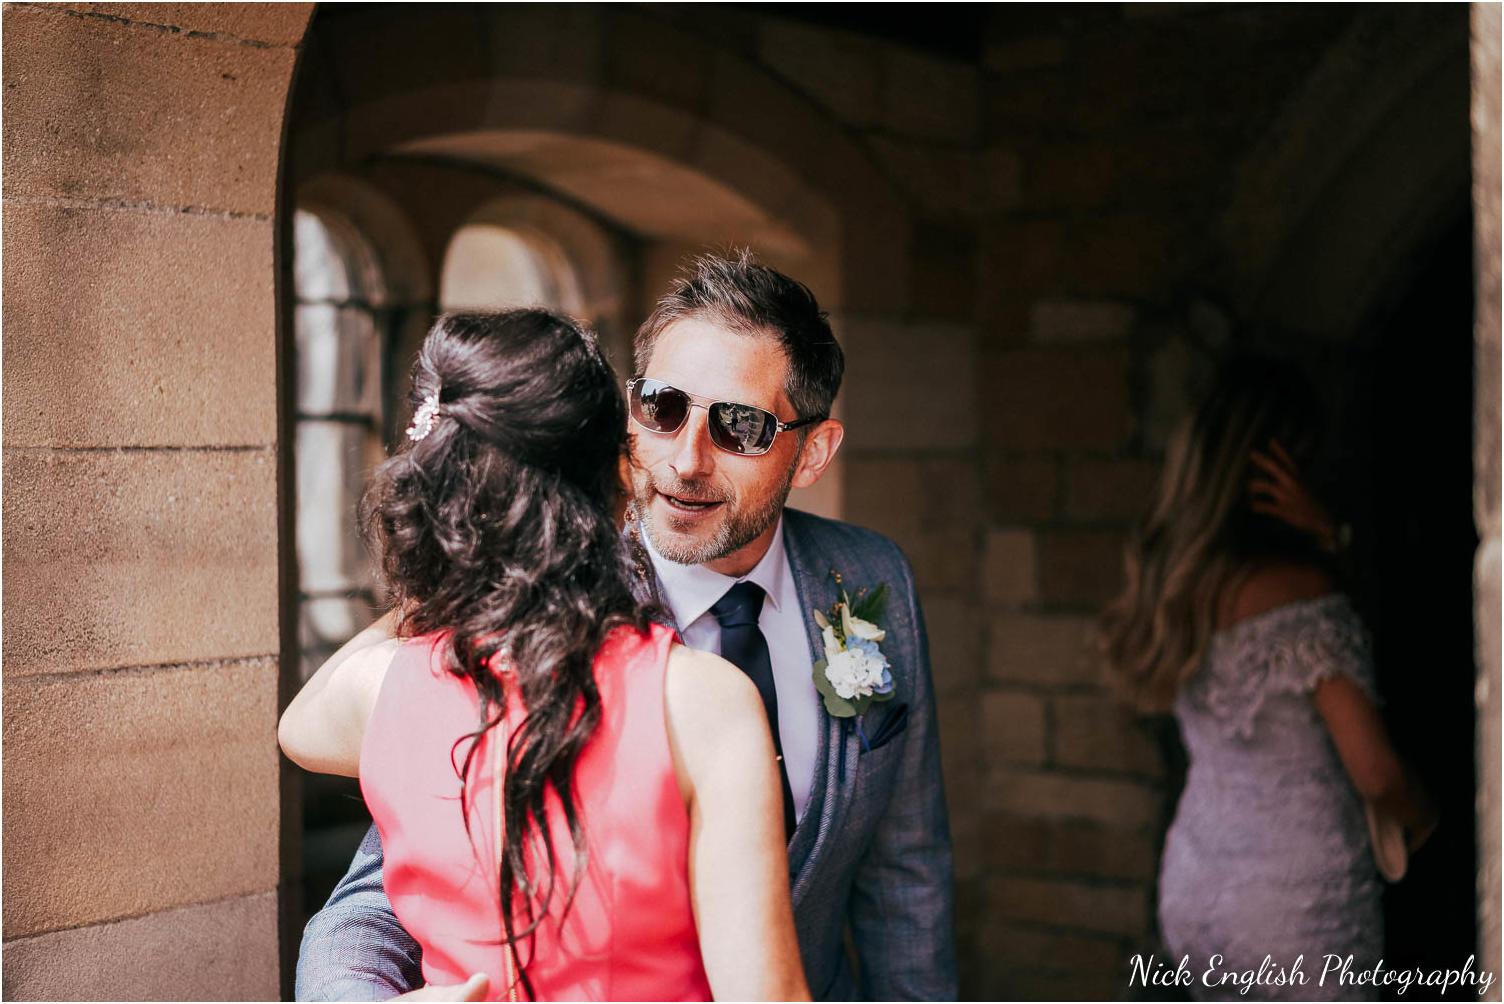 Mitton_Hall_Wedding_Photographer-20.jpg